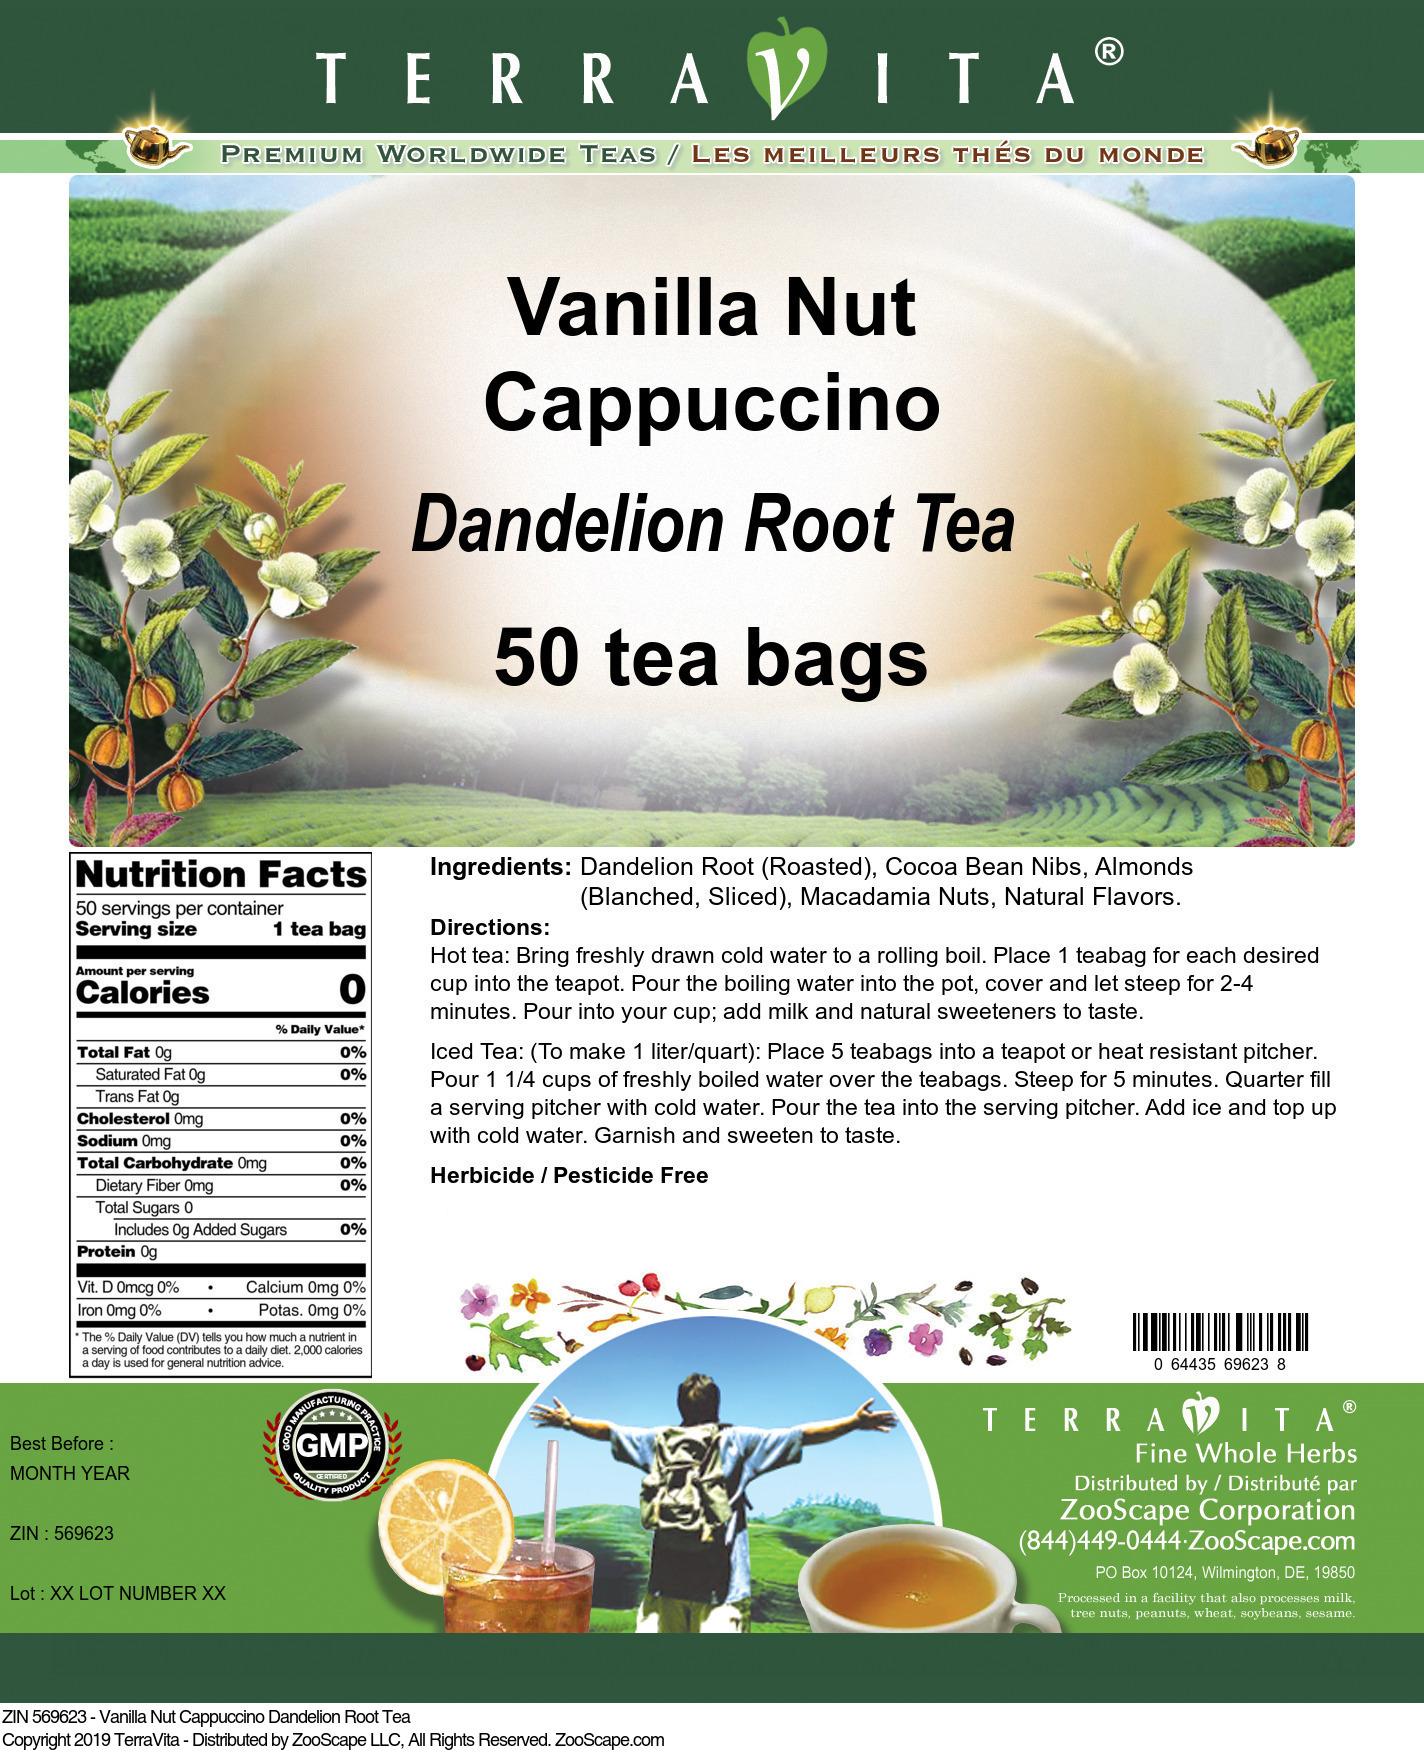 Vanilla Nut Cappuccino Dandelion Root Tea